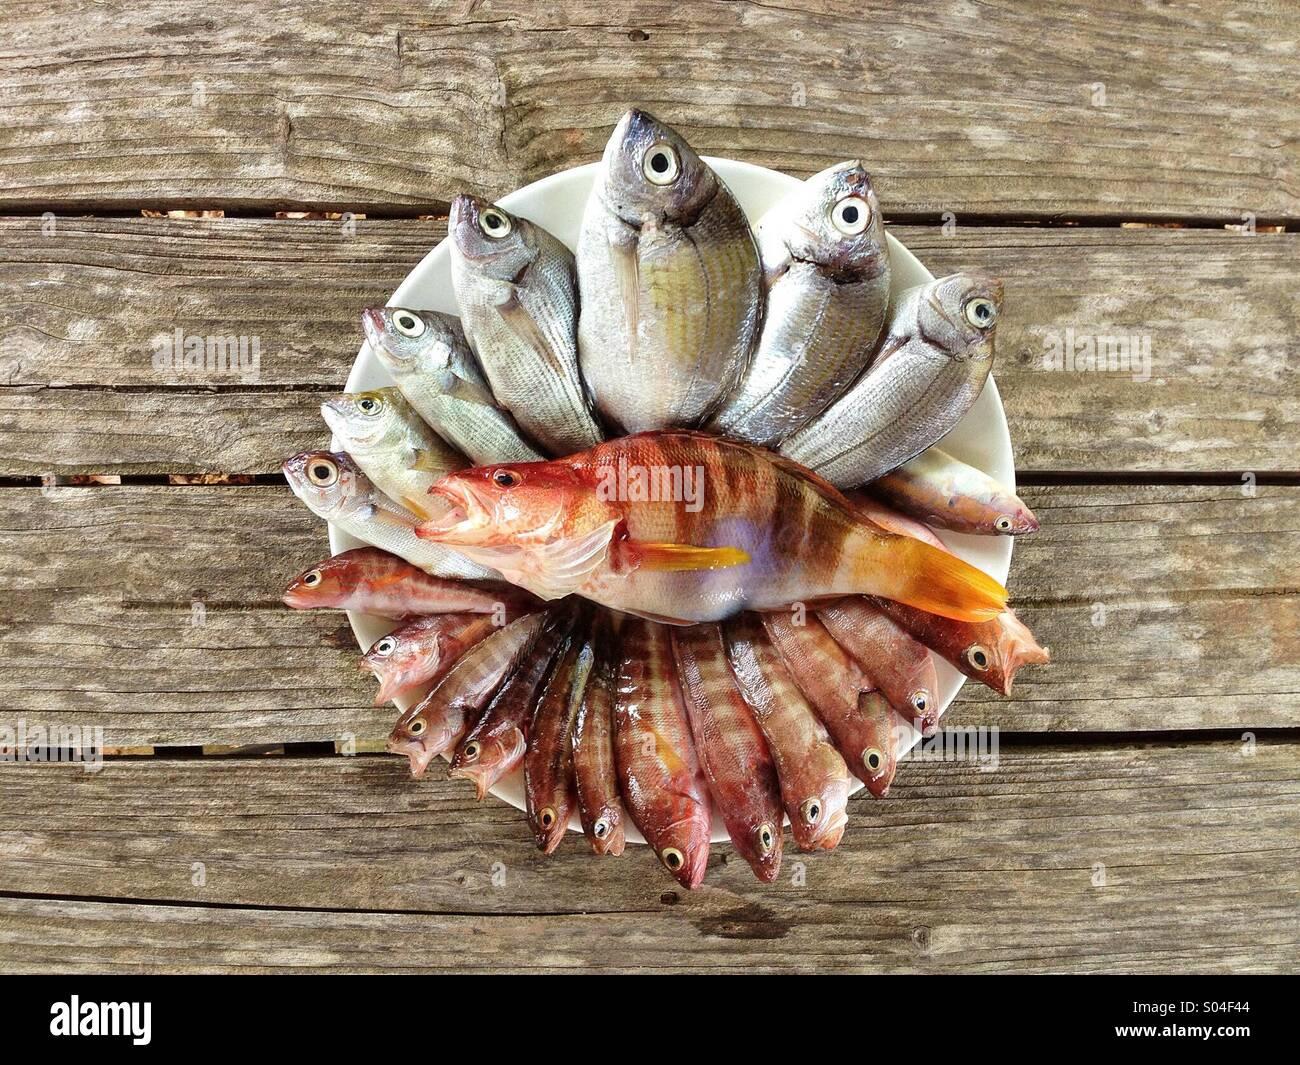 Today fishing - Stock Image